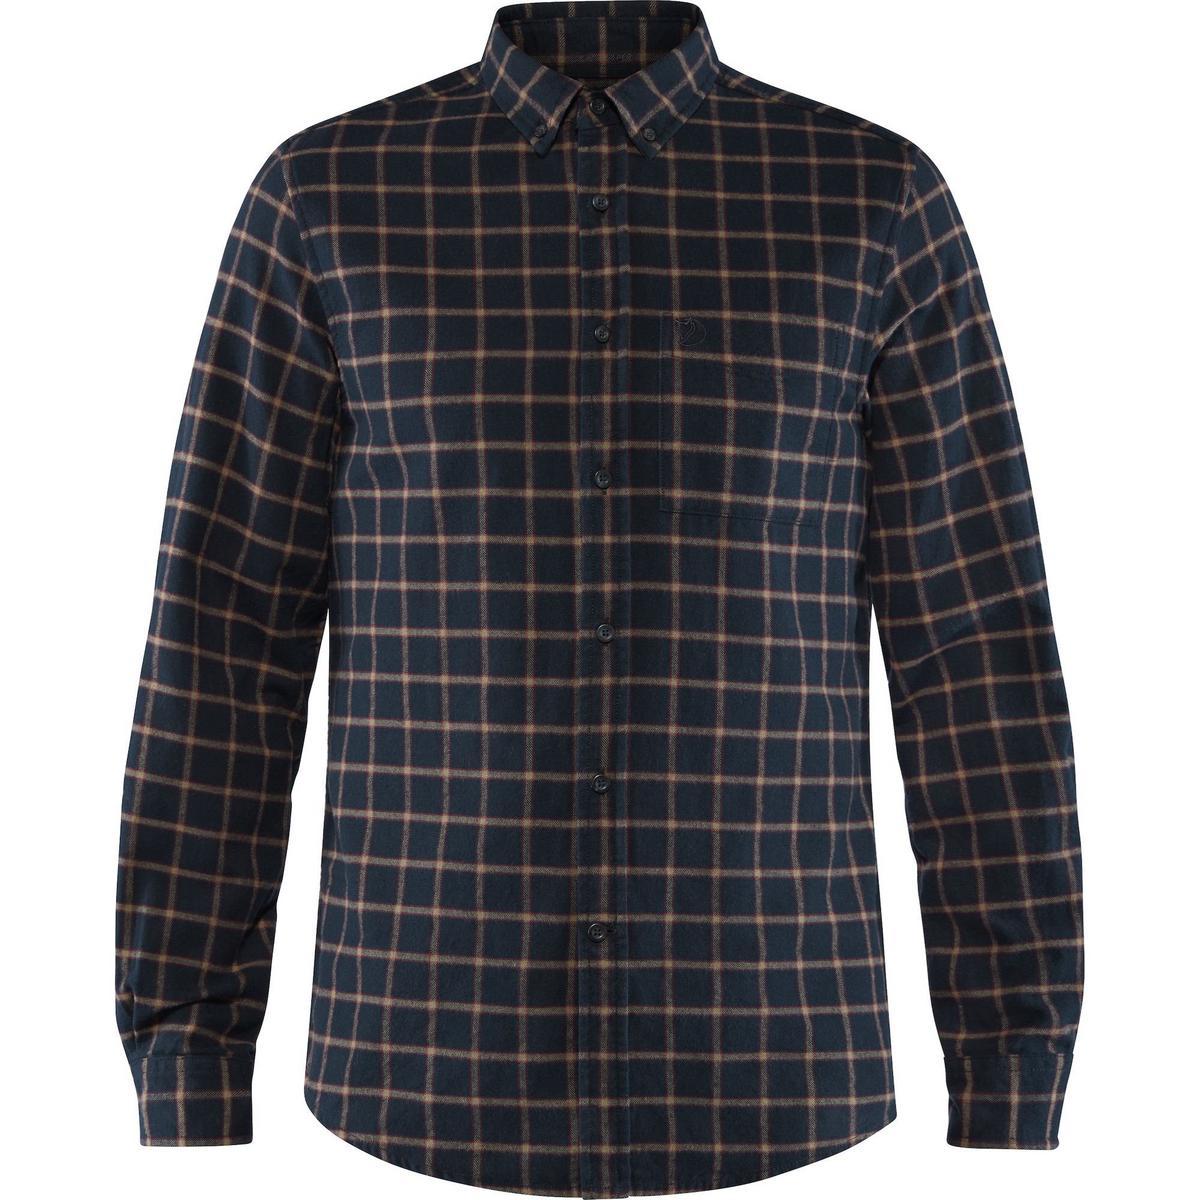 Fjallraven Men's Ovik Flannel Shirt - Dark Navy